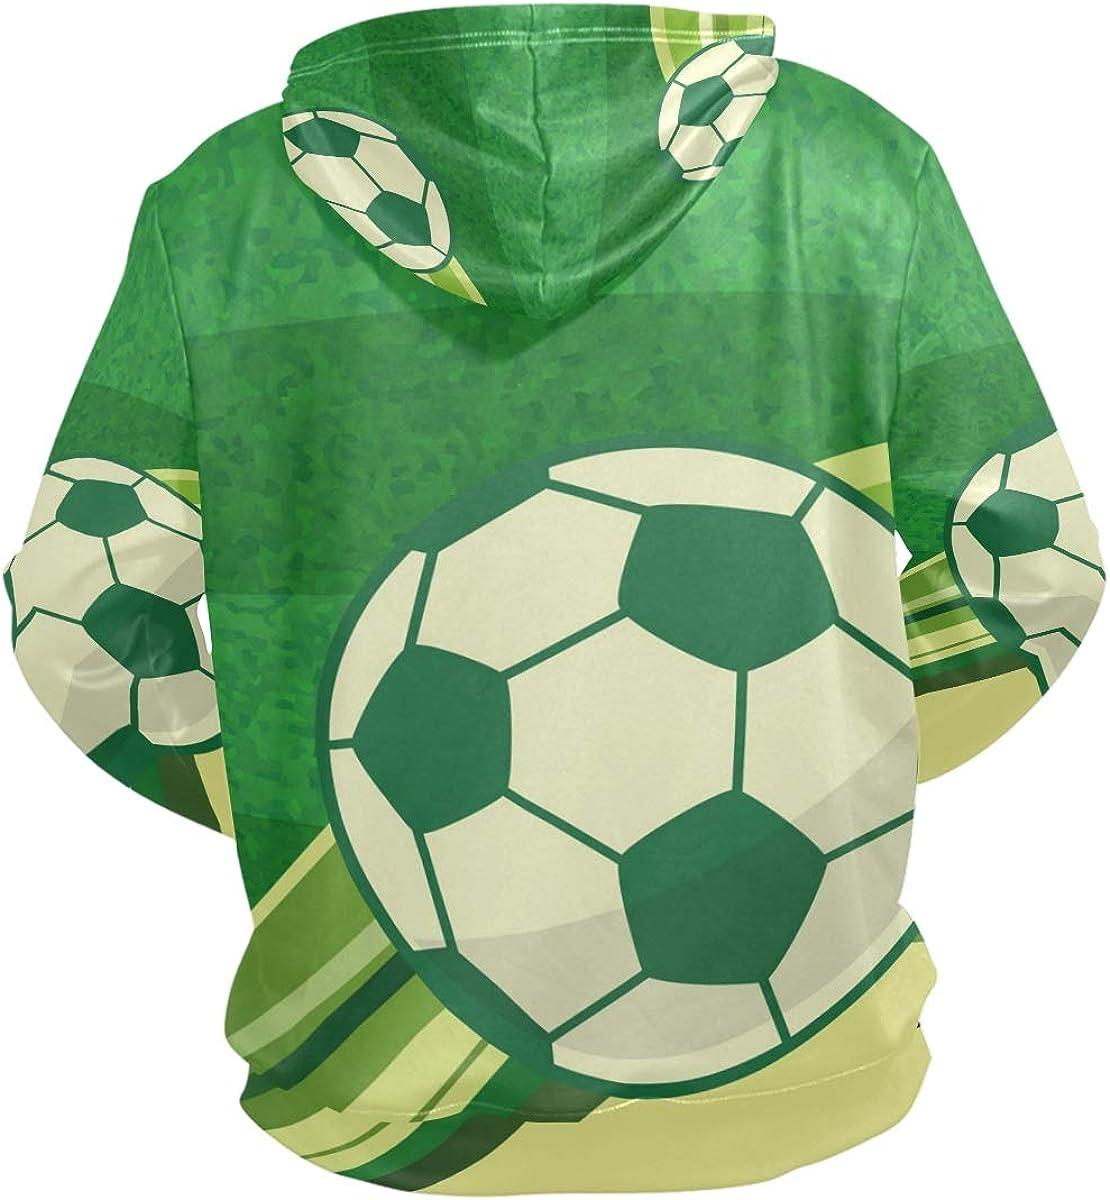 Zip Up Hoodie Soccer Ball Sports Hooded Sweatshirt for Men